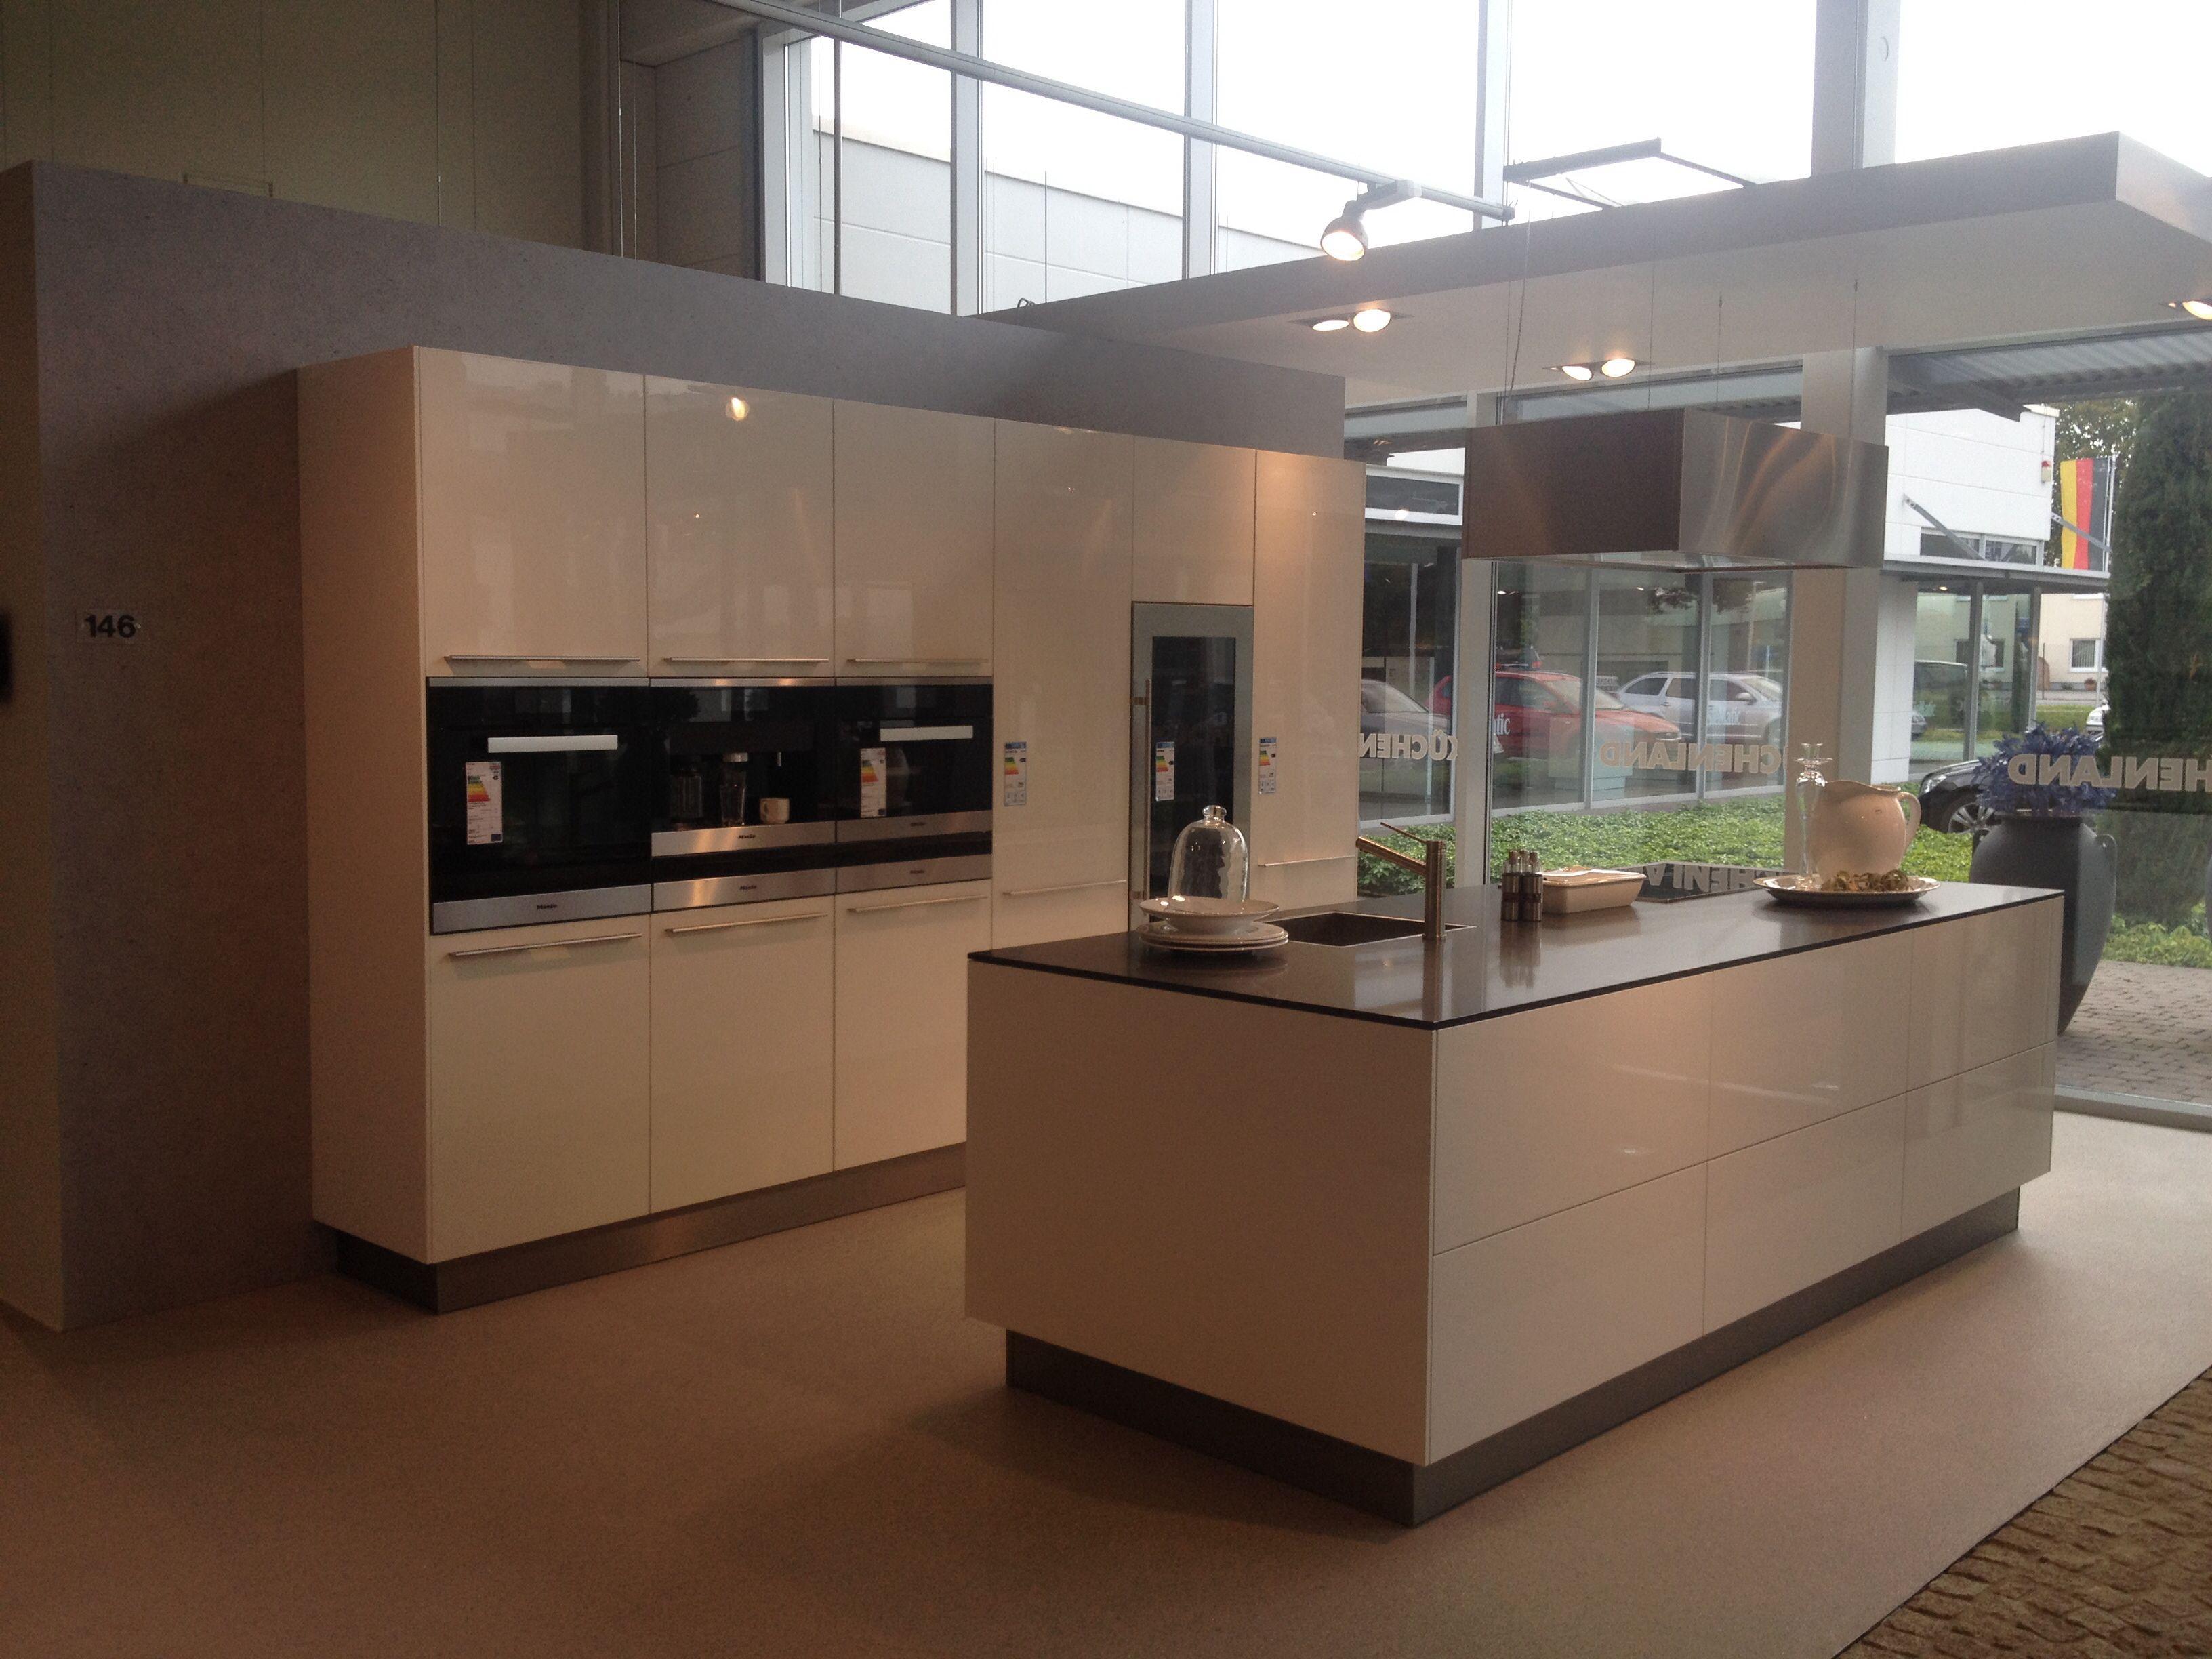 Keuken ekelhoff nordhorn kastenwand met apparatuur en kookeiland